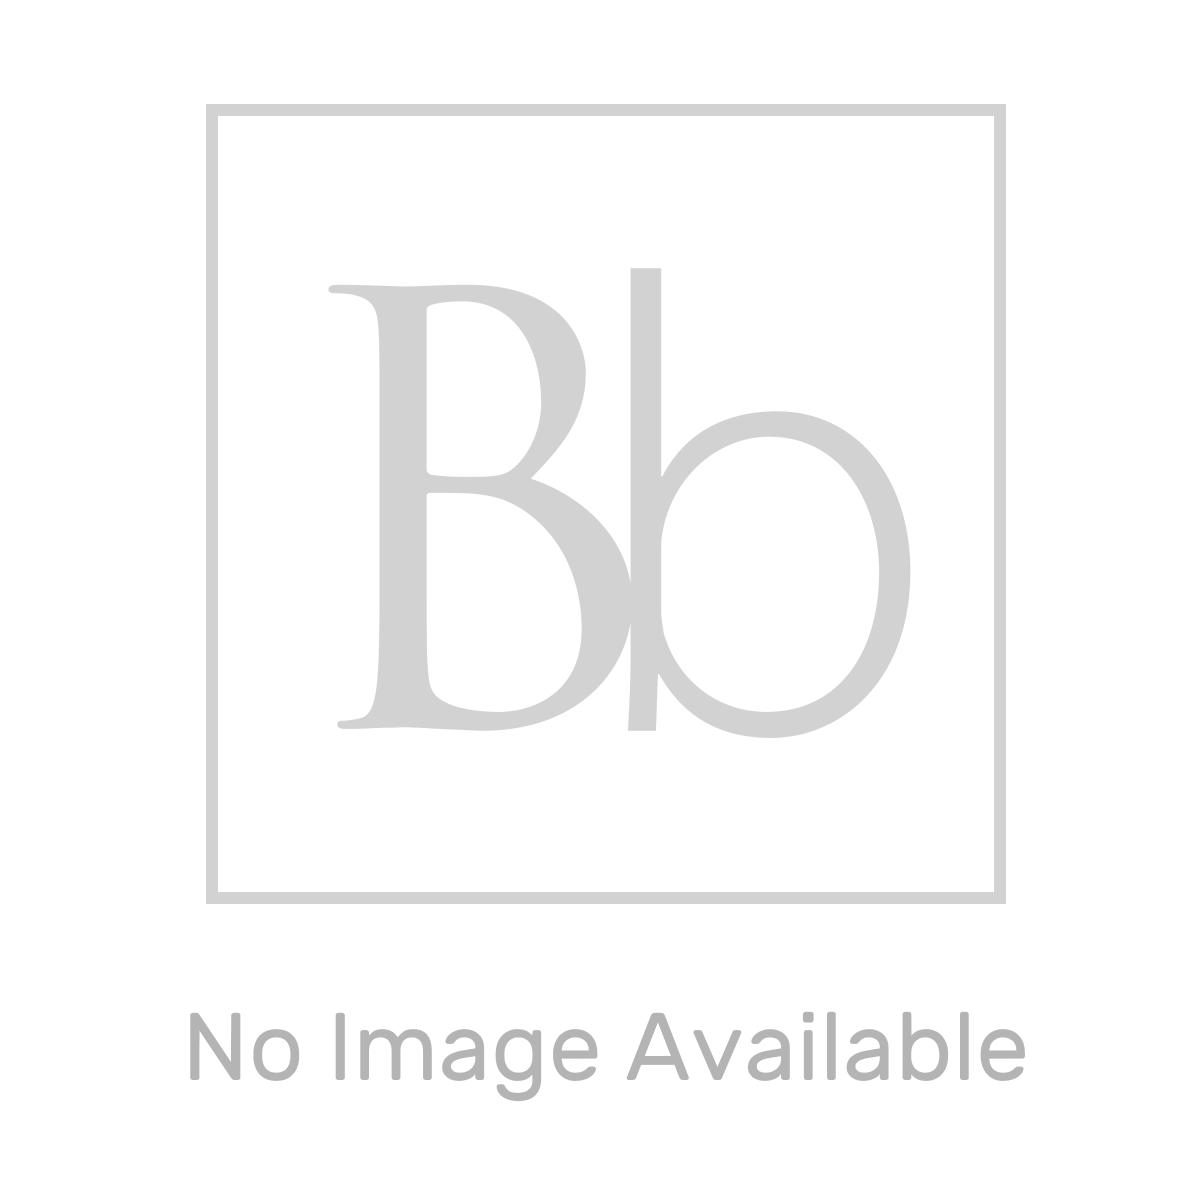 Tavistock Kobe White Floor Mounted Vanity Unit 450mm Dimensions